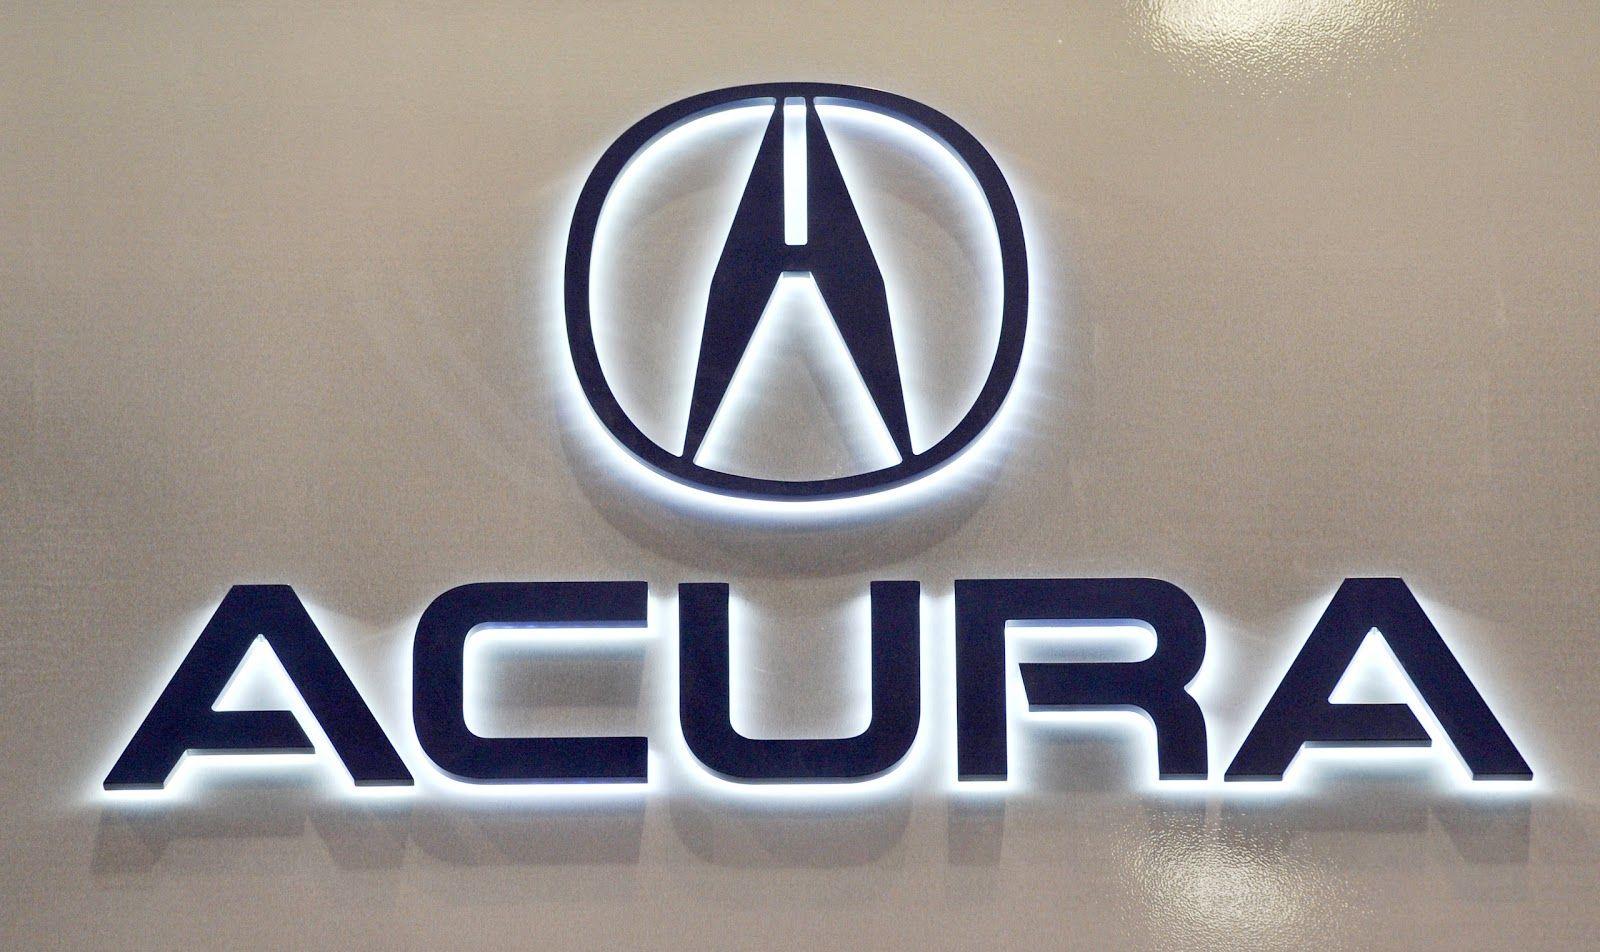 AcuraSymboljpg Acura Gallery Pinterest - Acura symbol for car